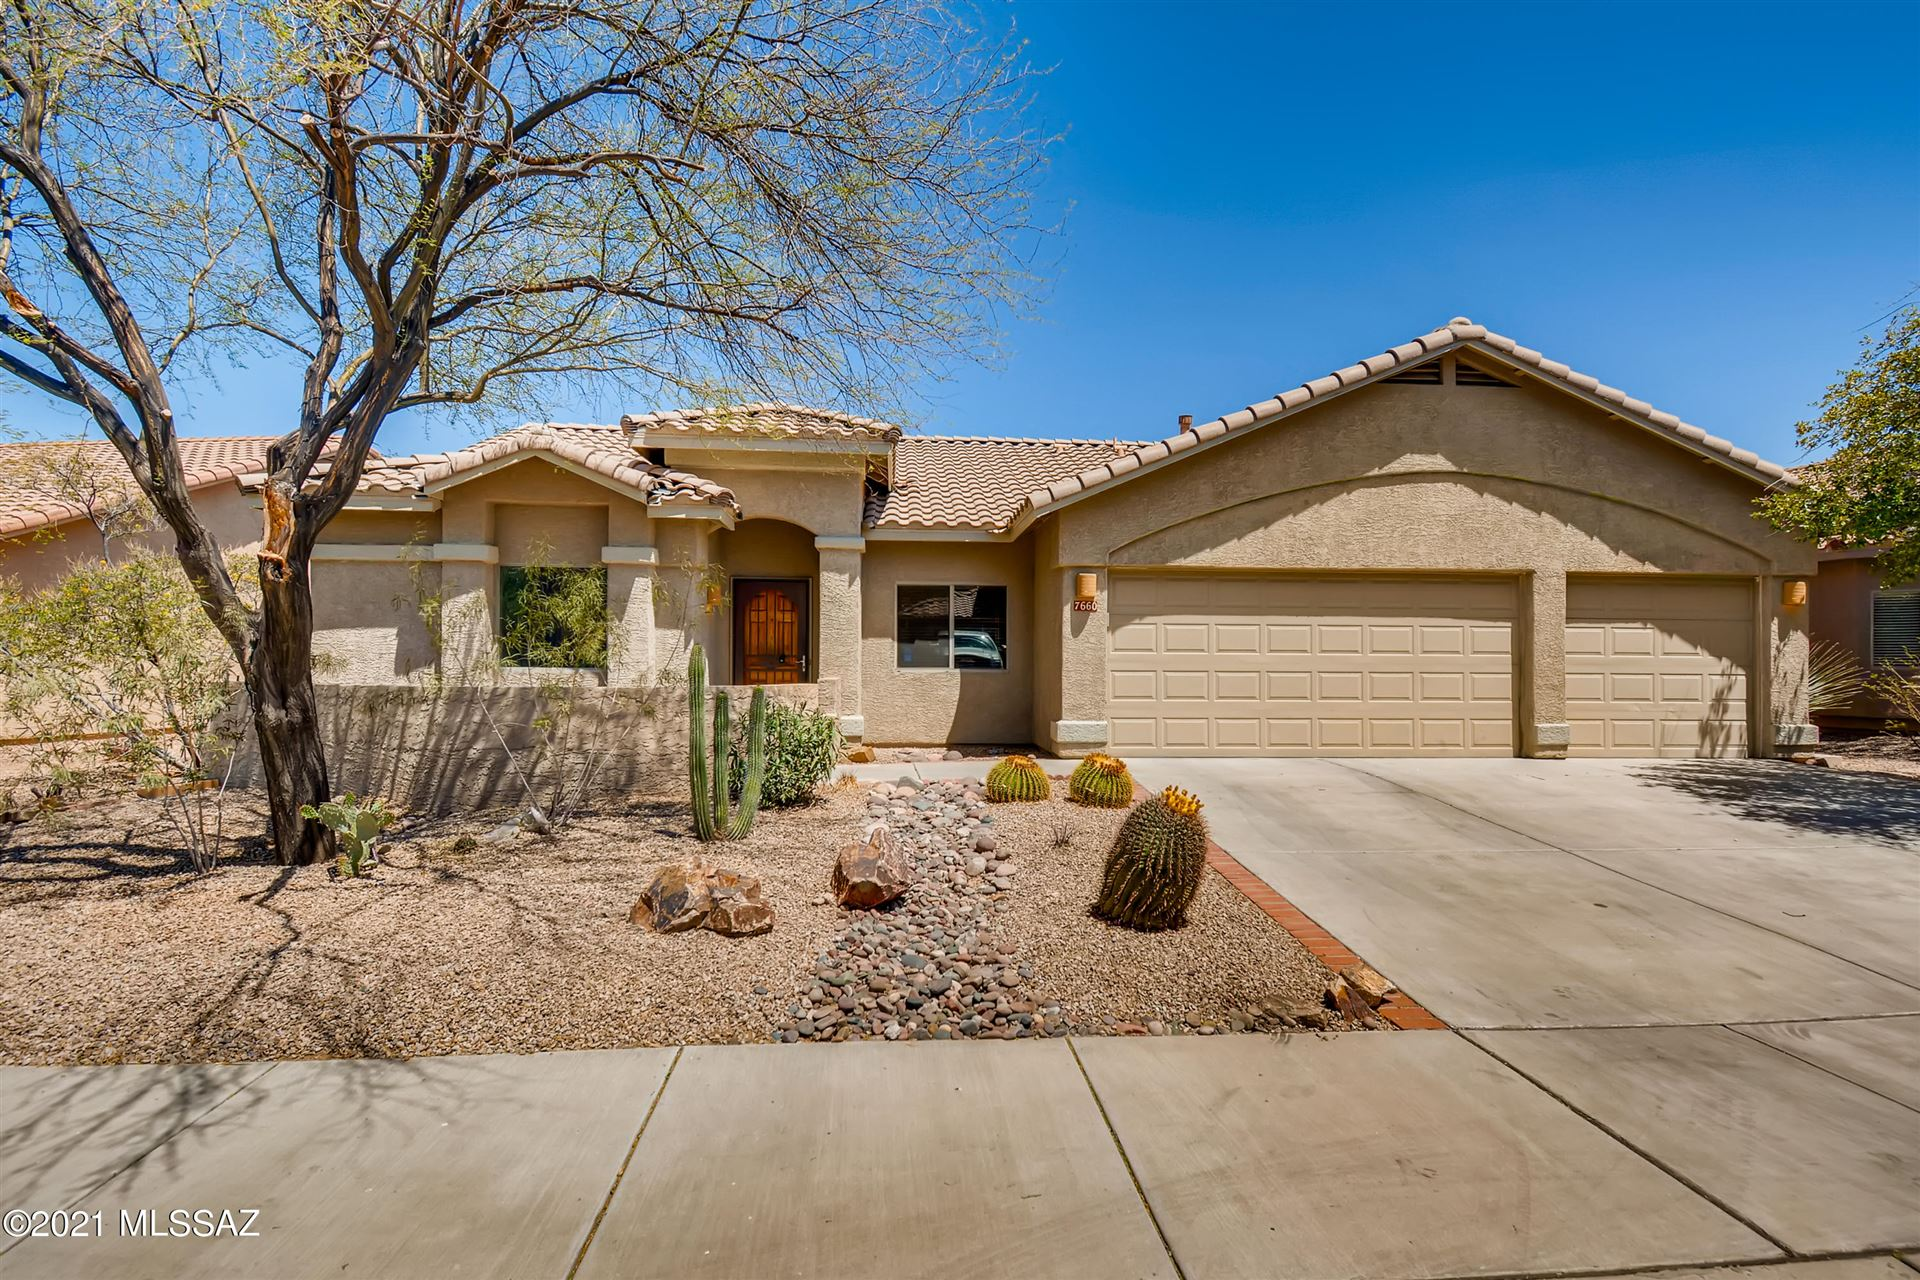 7660 W Quachila Court, Tucson, AZ 85743 - MLS#: 22110164